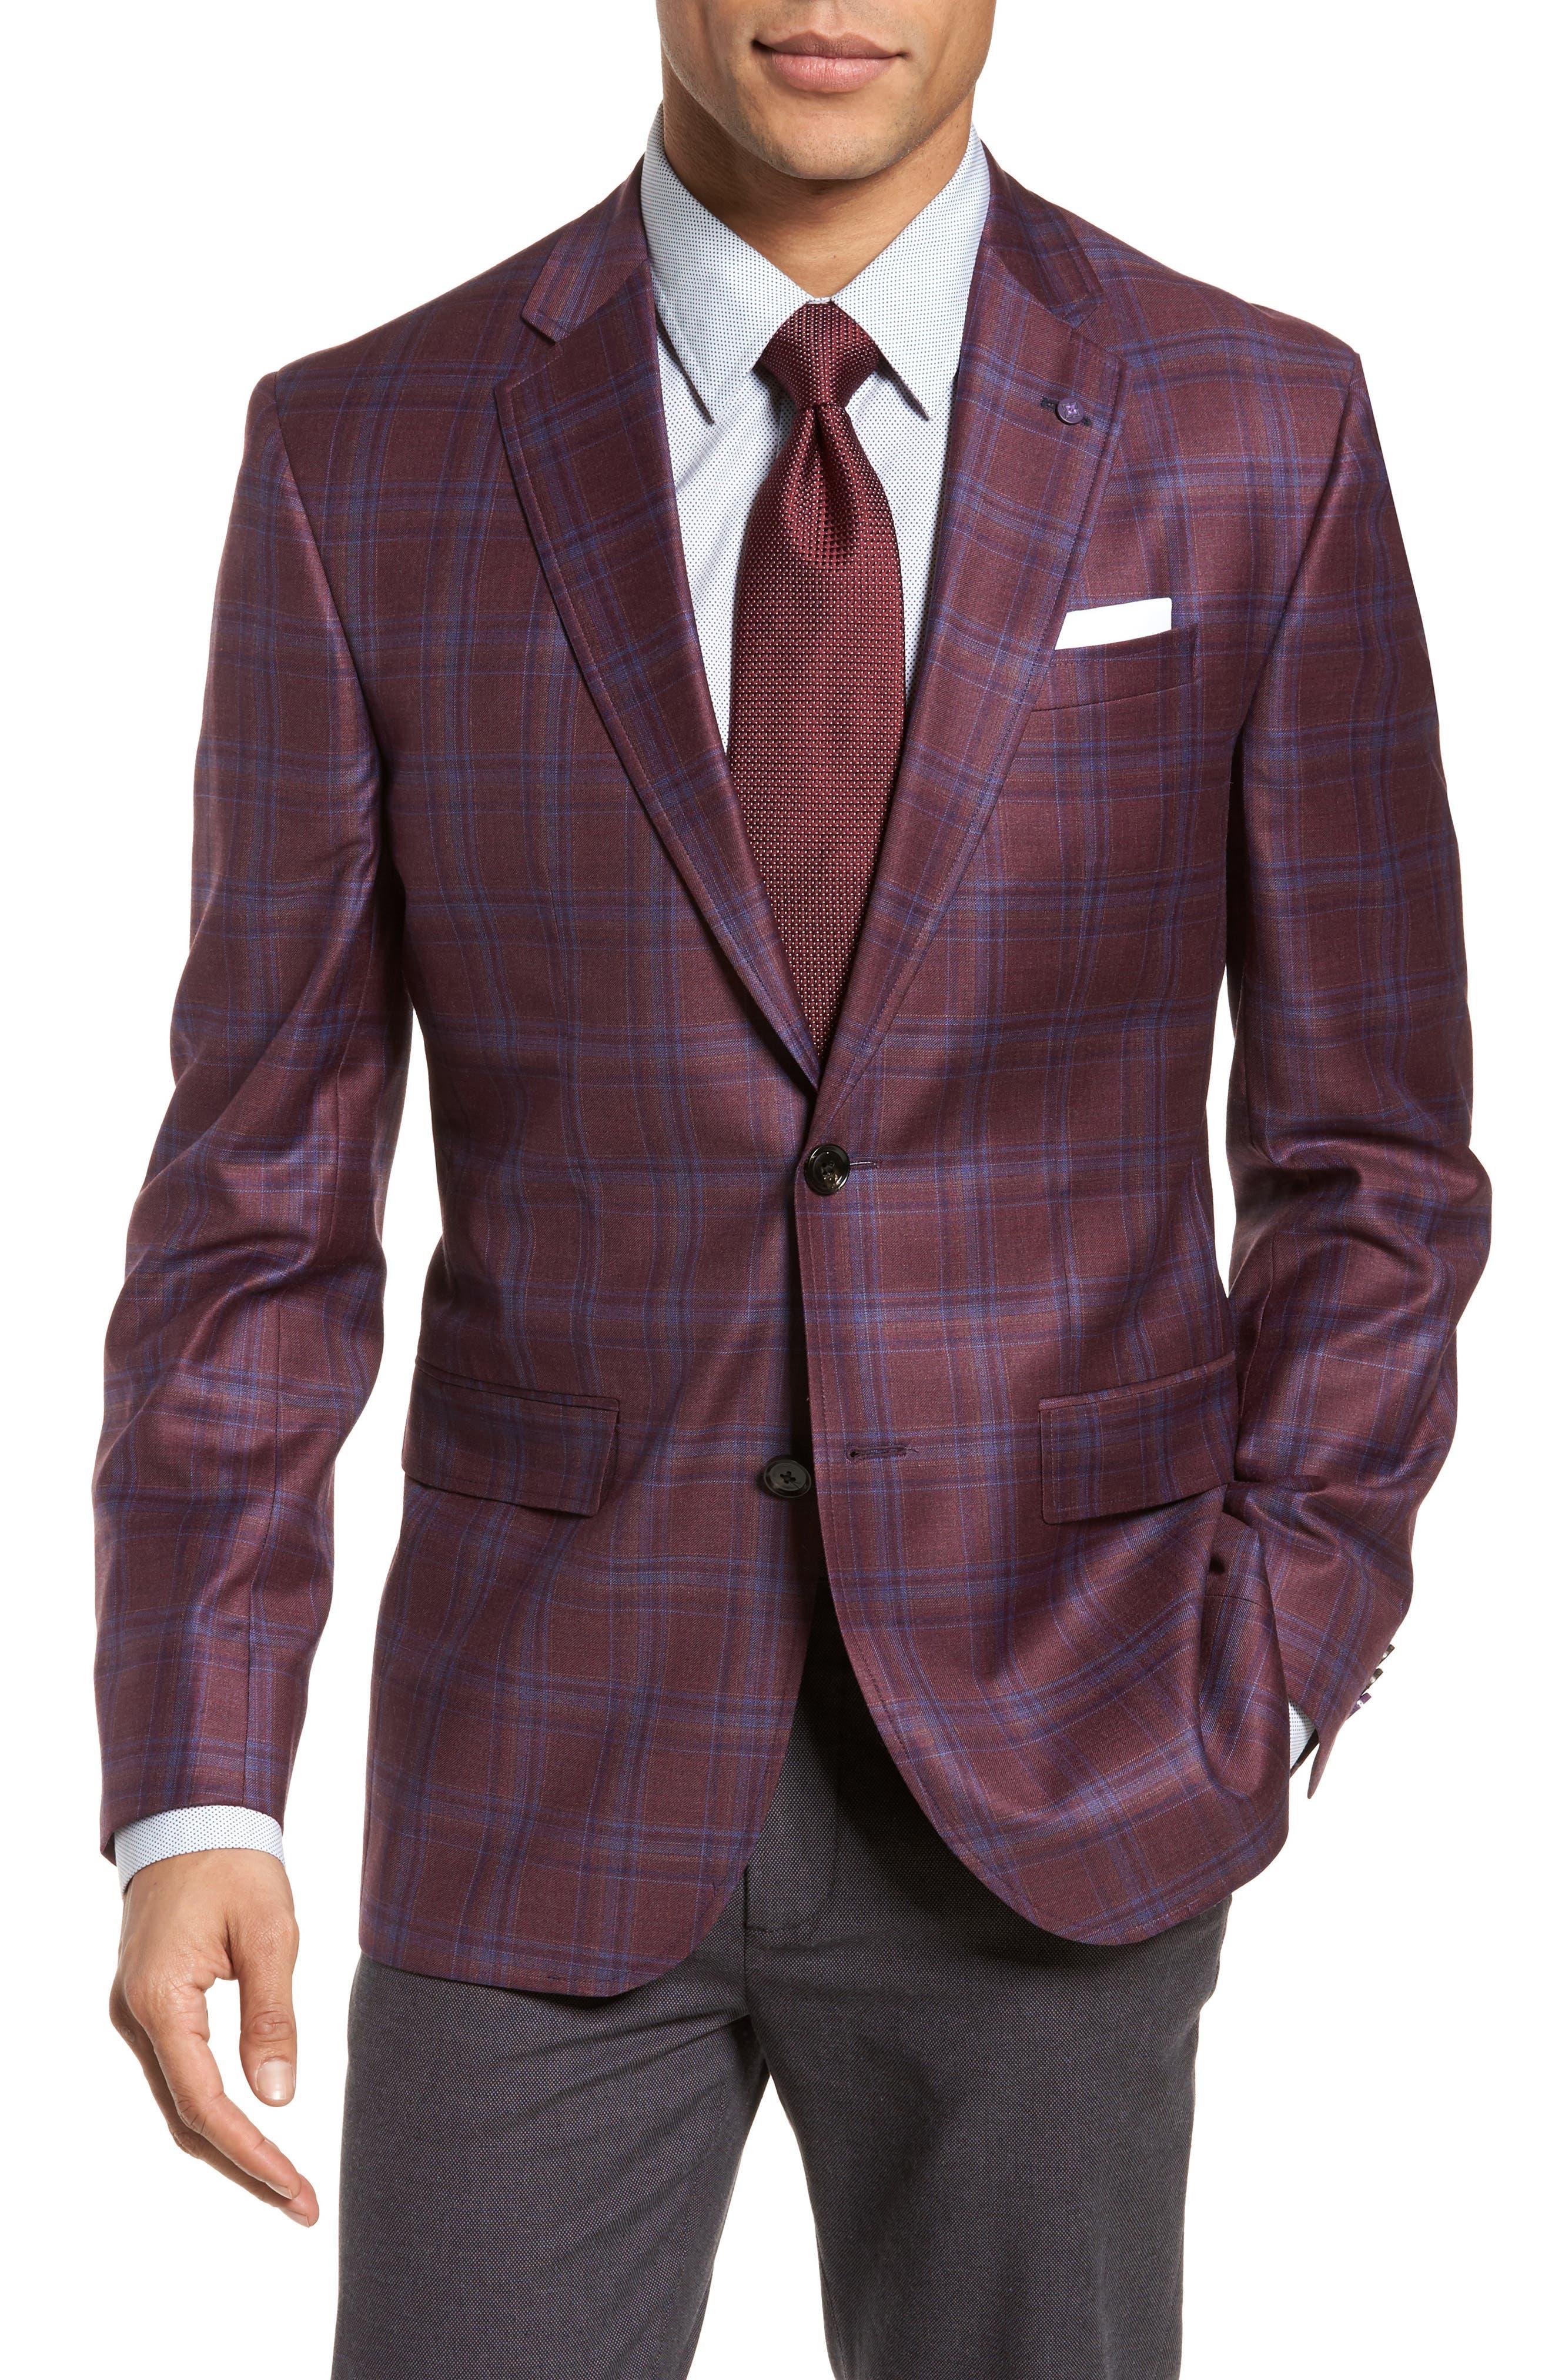 Jay Trim Fit Plaid Wool Sport Coat,                             Main thumbnail 1, color,                             Red